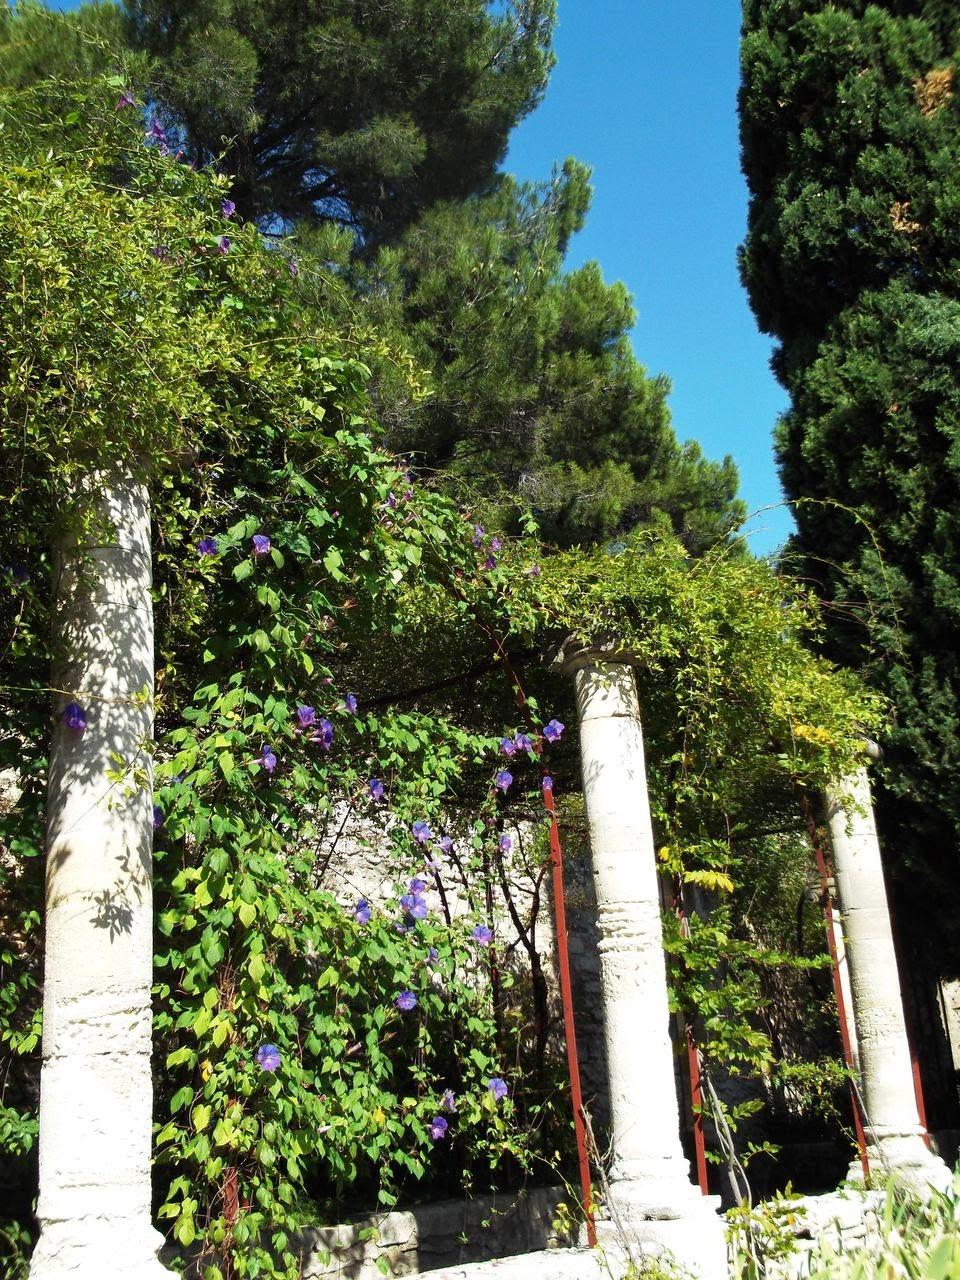 ecole cheval paysage les jardins remarquables de provence. Black Bedroom Furniture Sets. Home Design Ideas